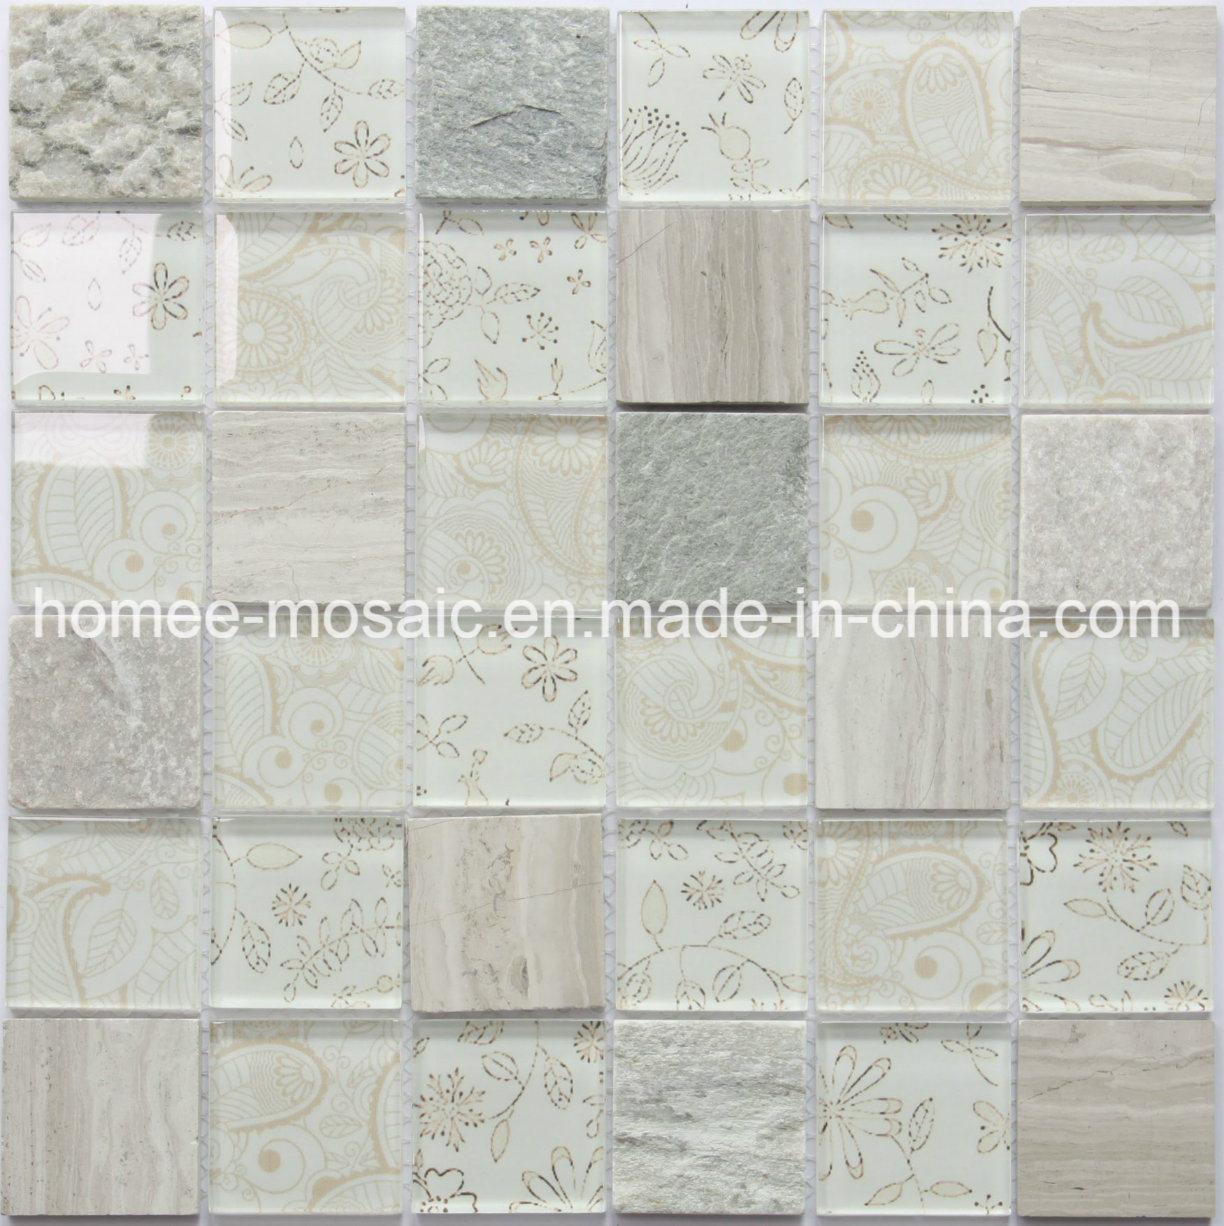 Bathroom Mosaic Tile Image Of